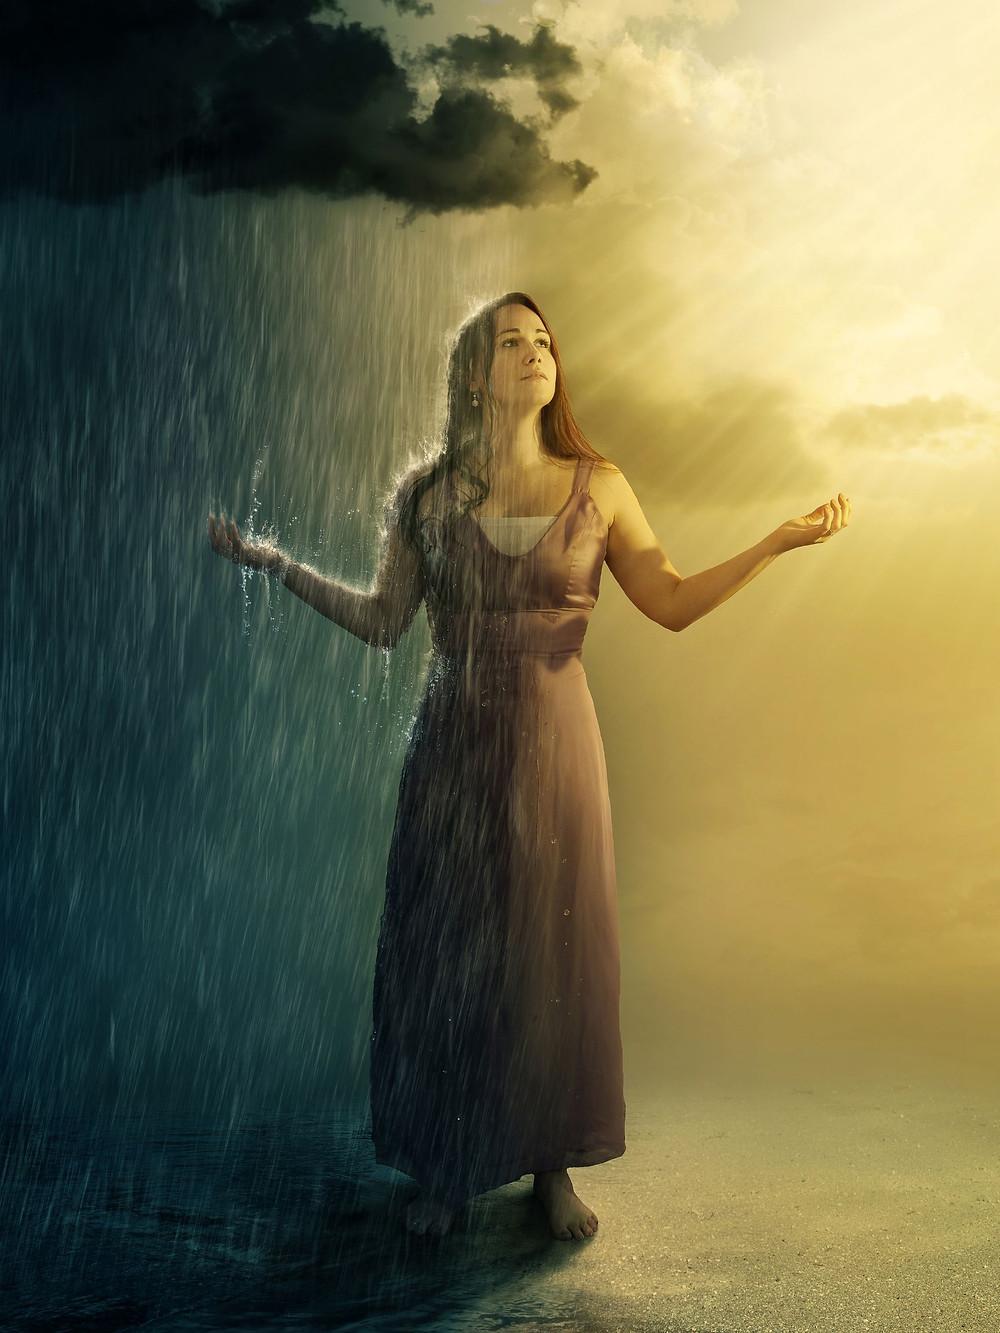 It will rain and it will shine